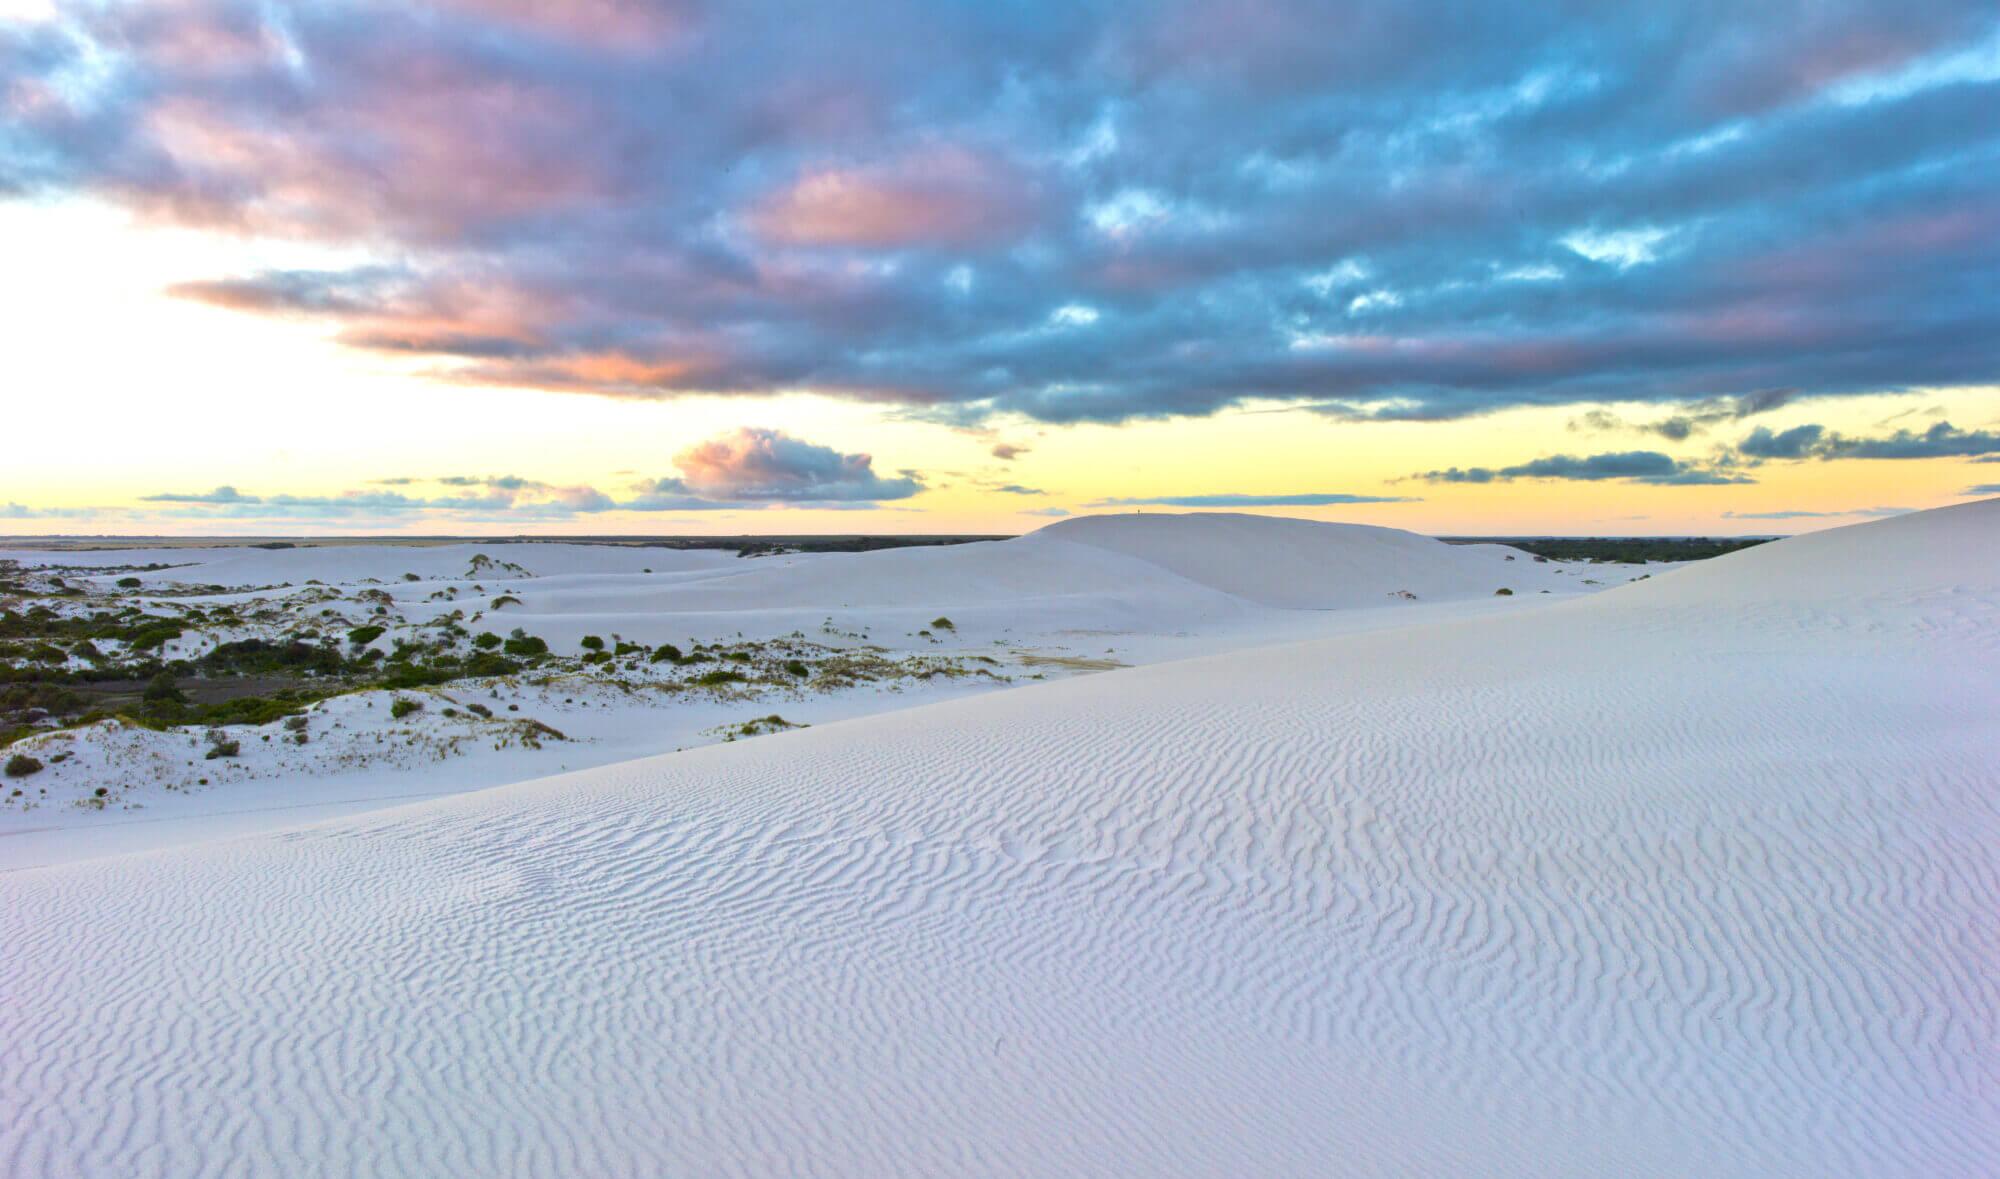 Sand dunes in Bremer Bay